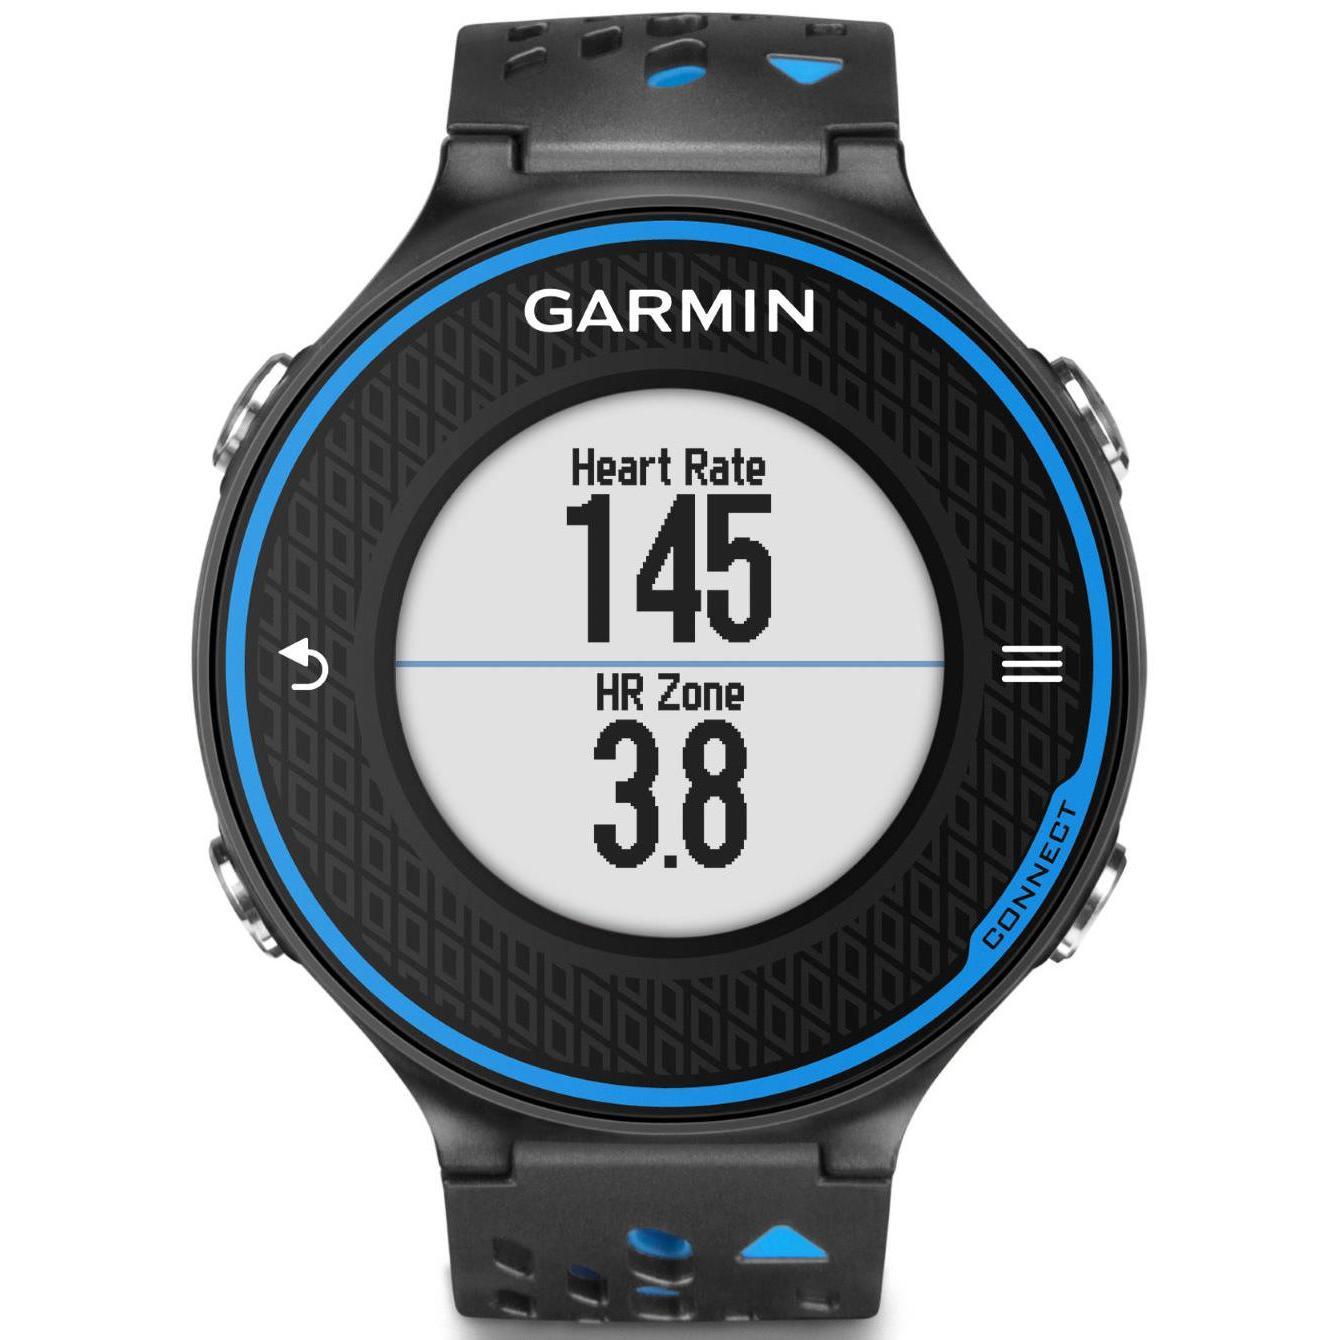 Reloj Garmin Forerunner 620 - Negro/Azul